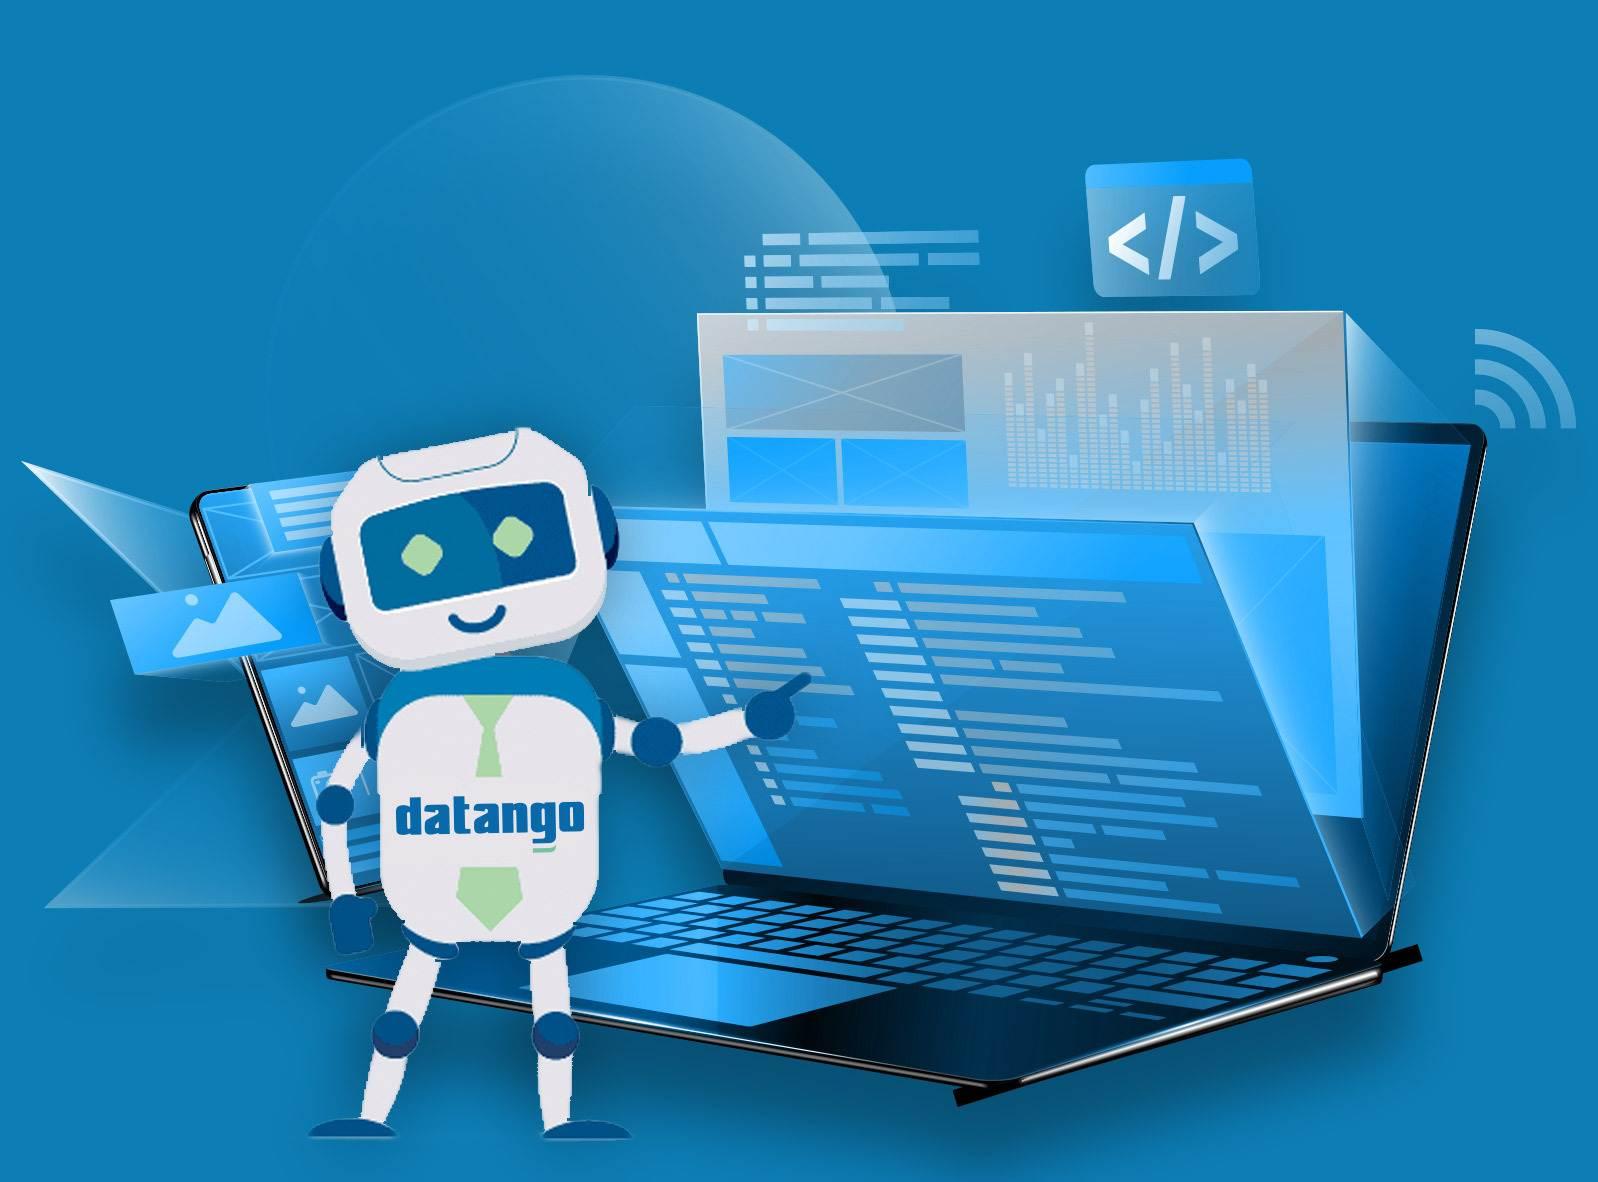 sap schulung, online schulung, datango, learning management system, it schulungen, web based training, digitale patientenakte, microsoft teams schulung, sap,